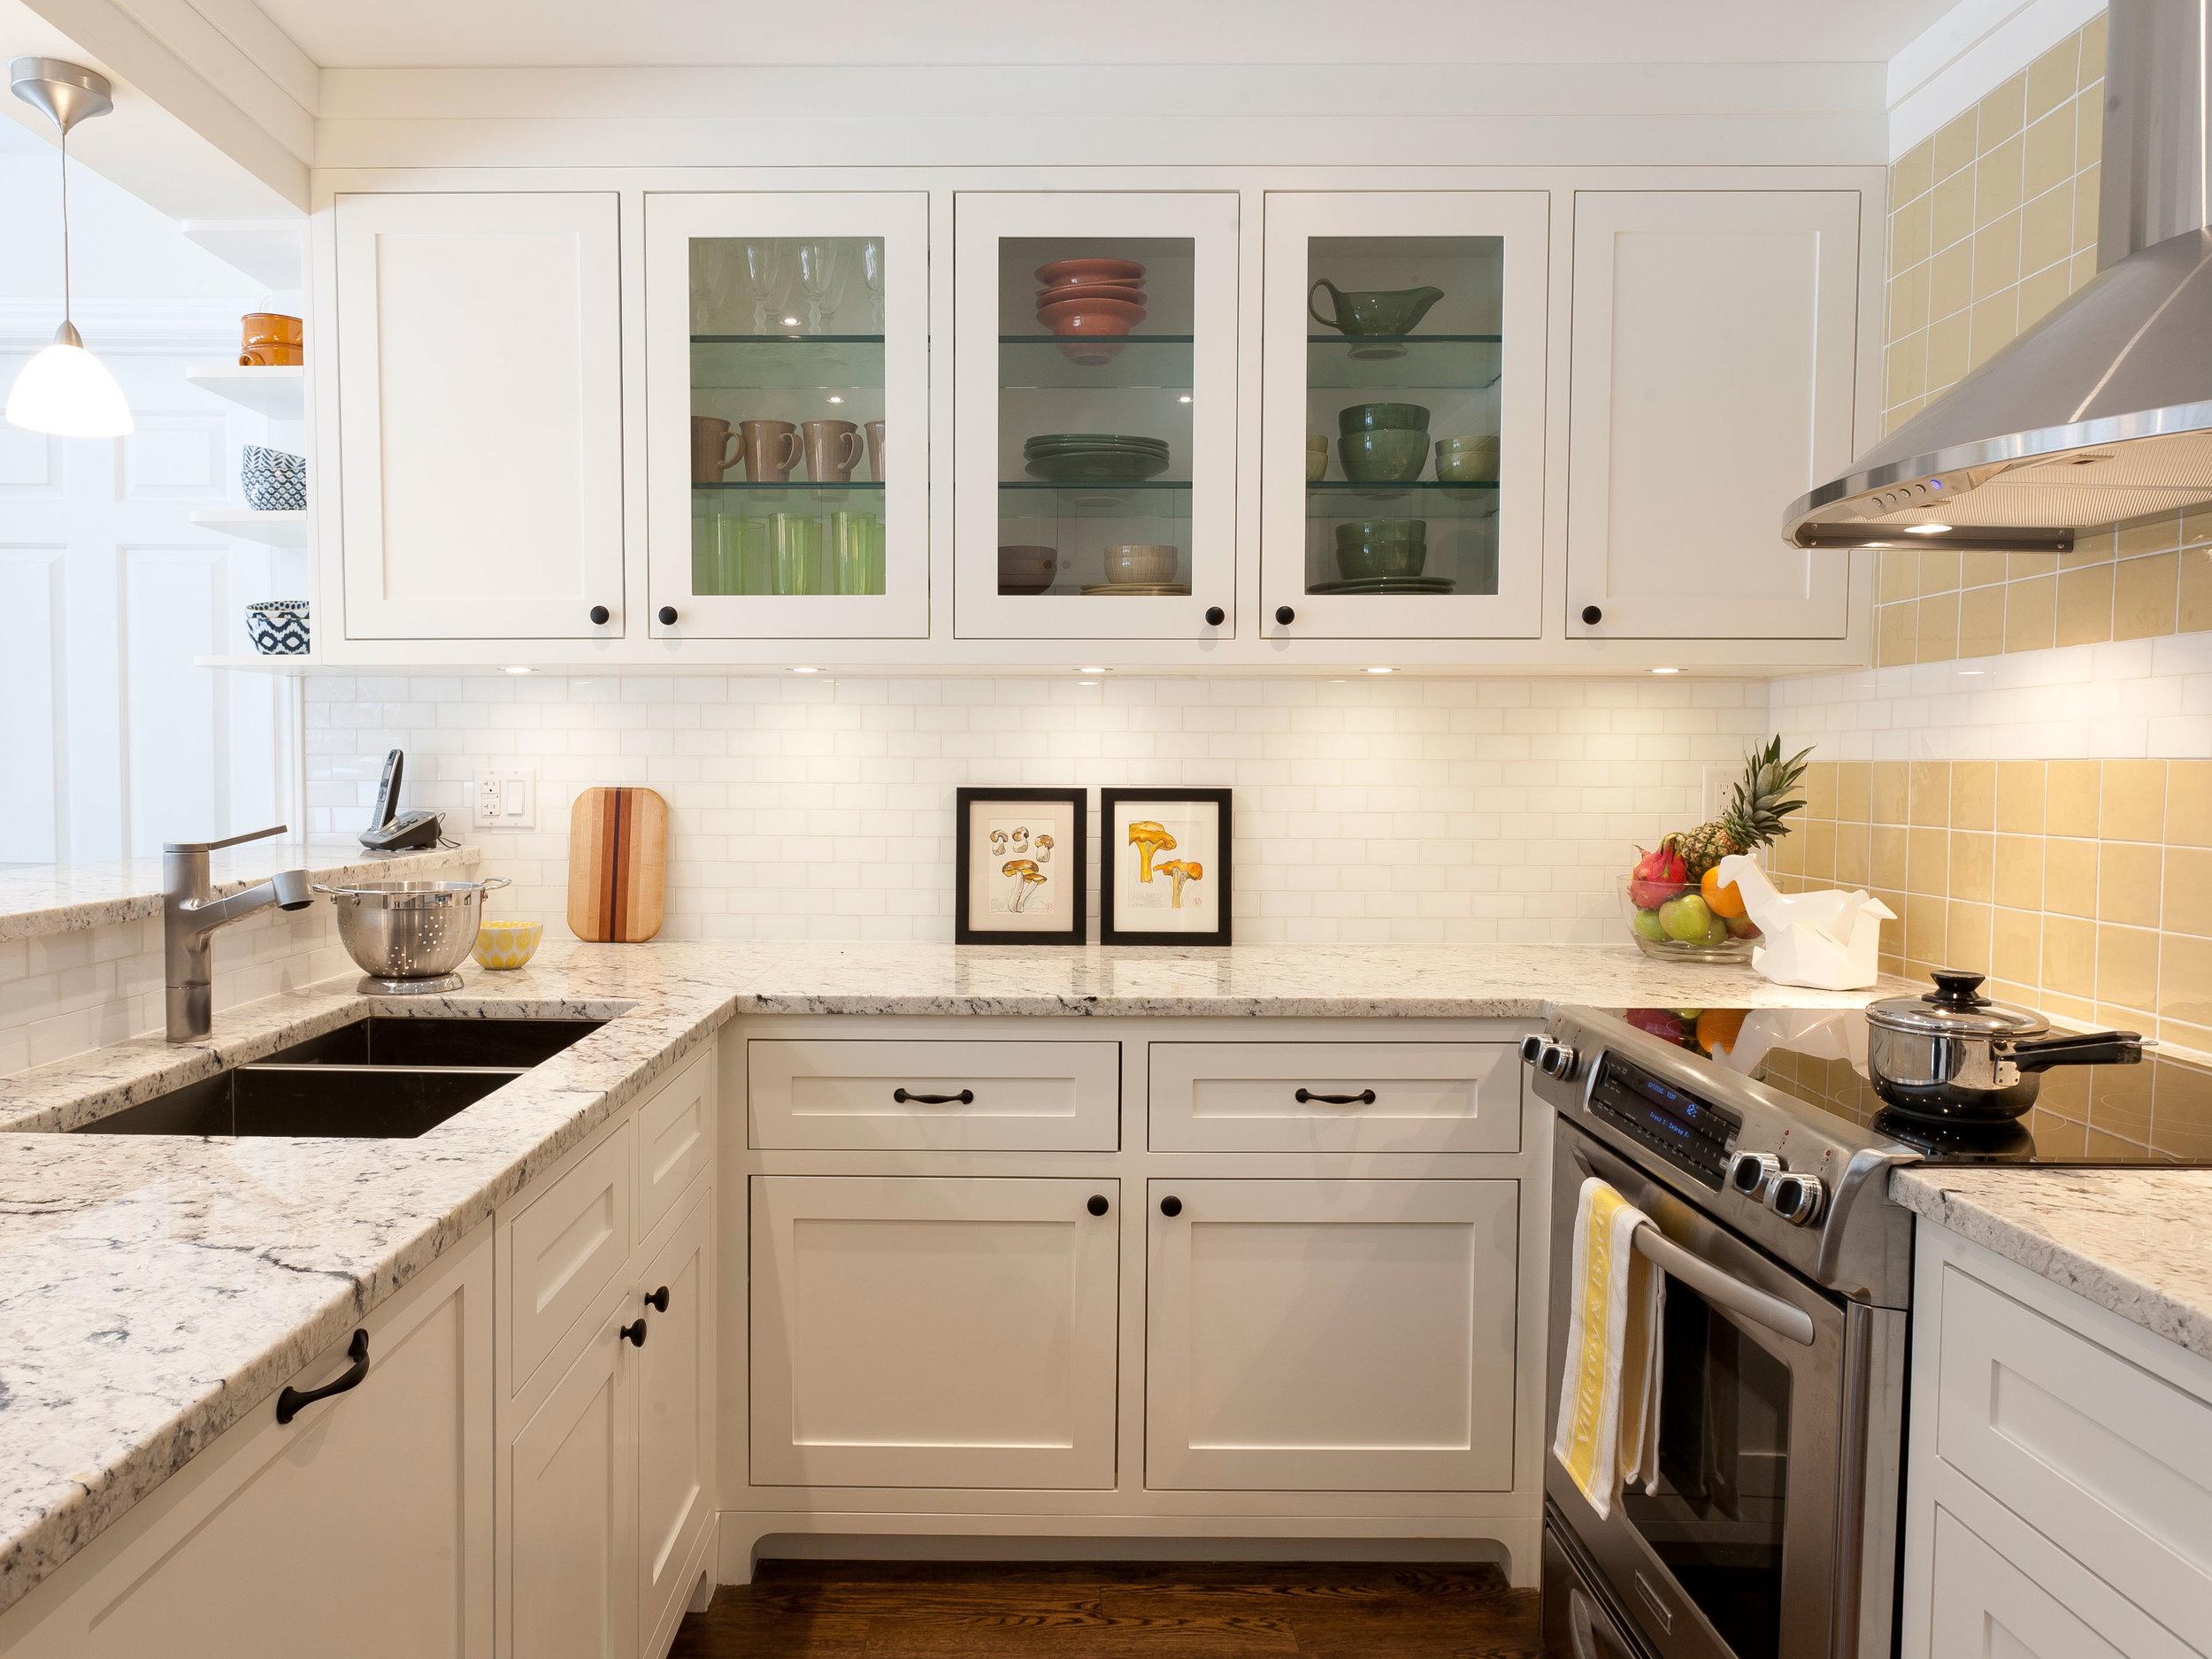 U shaped Kitchen with Glass Cabinets